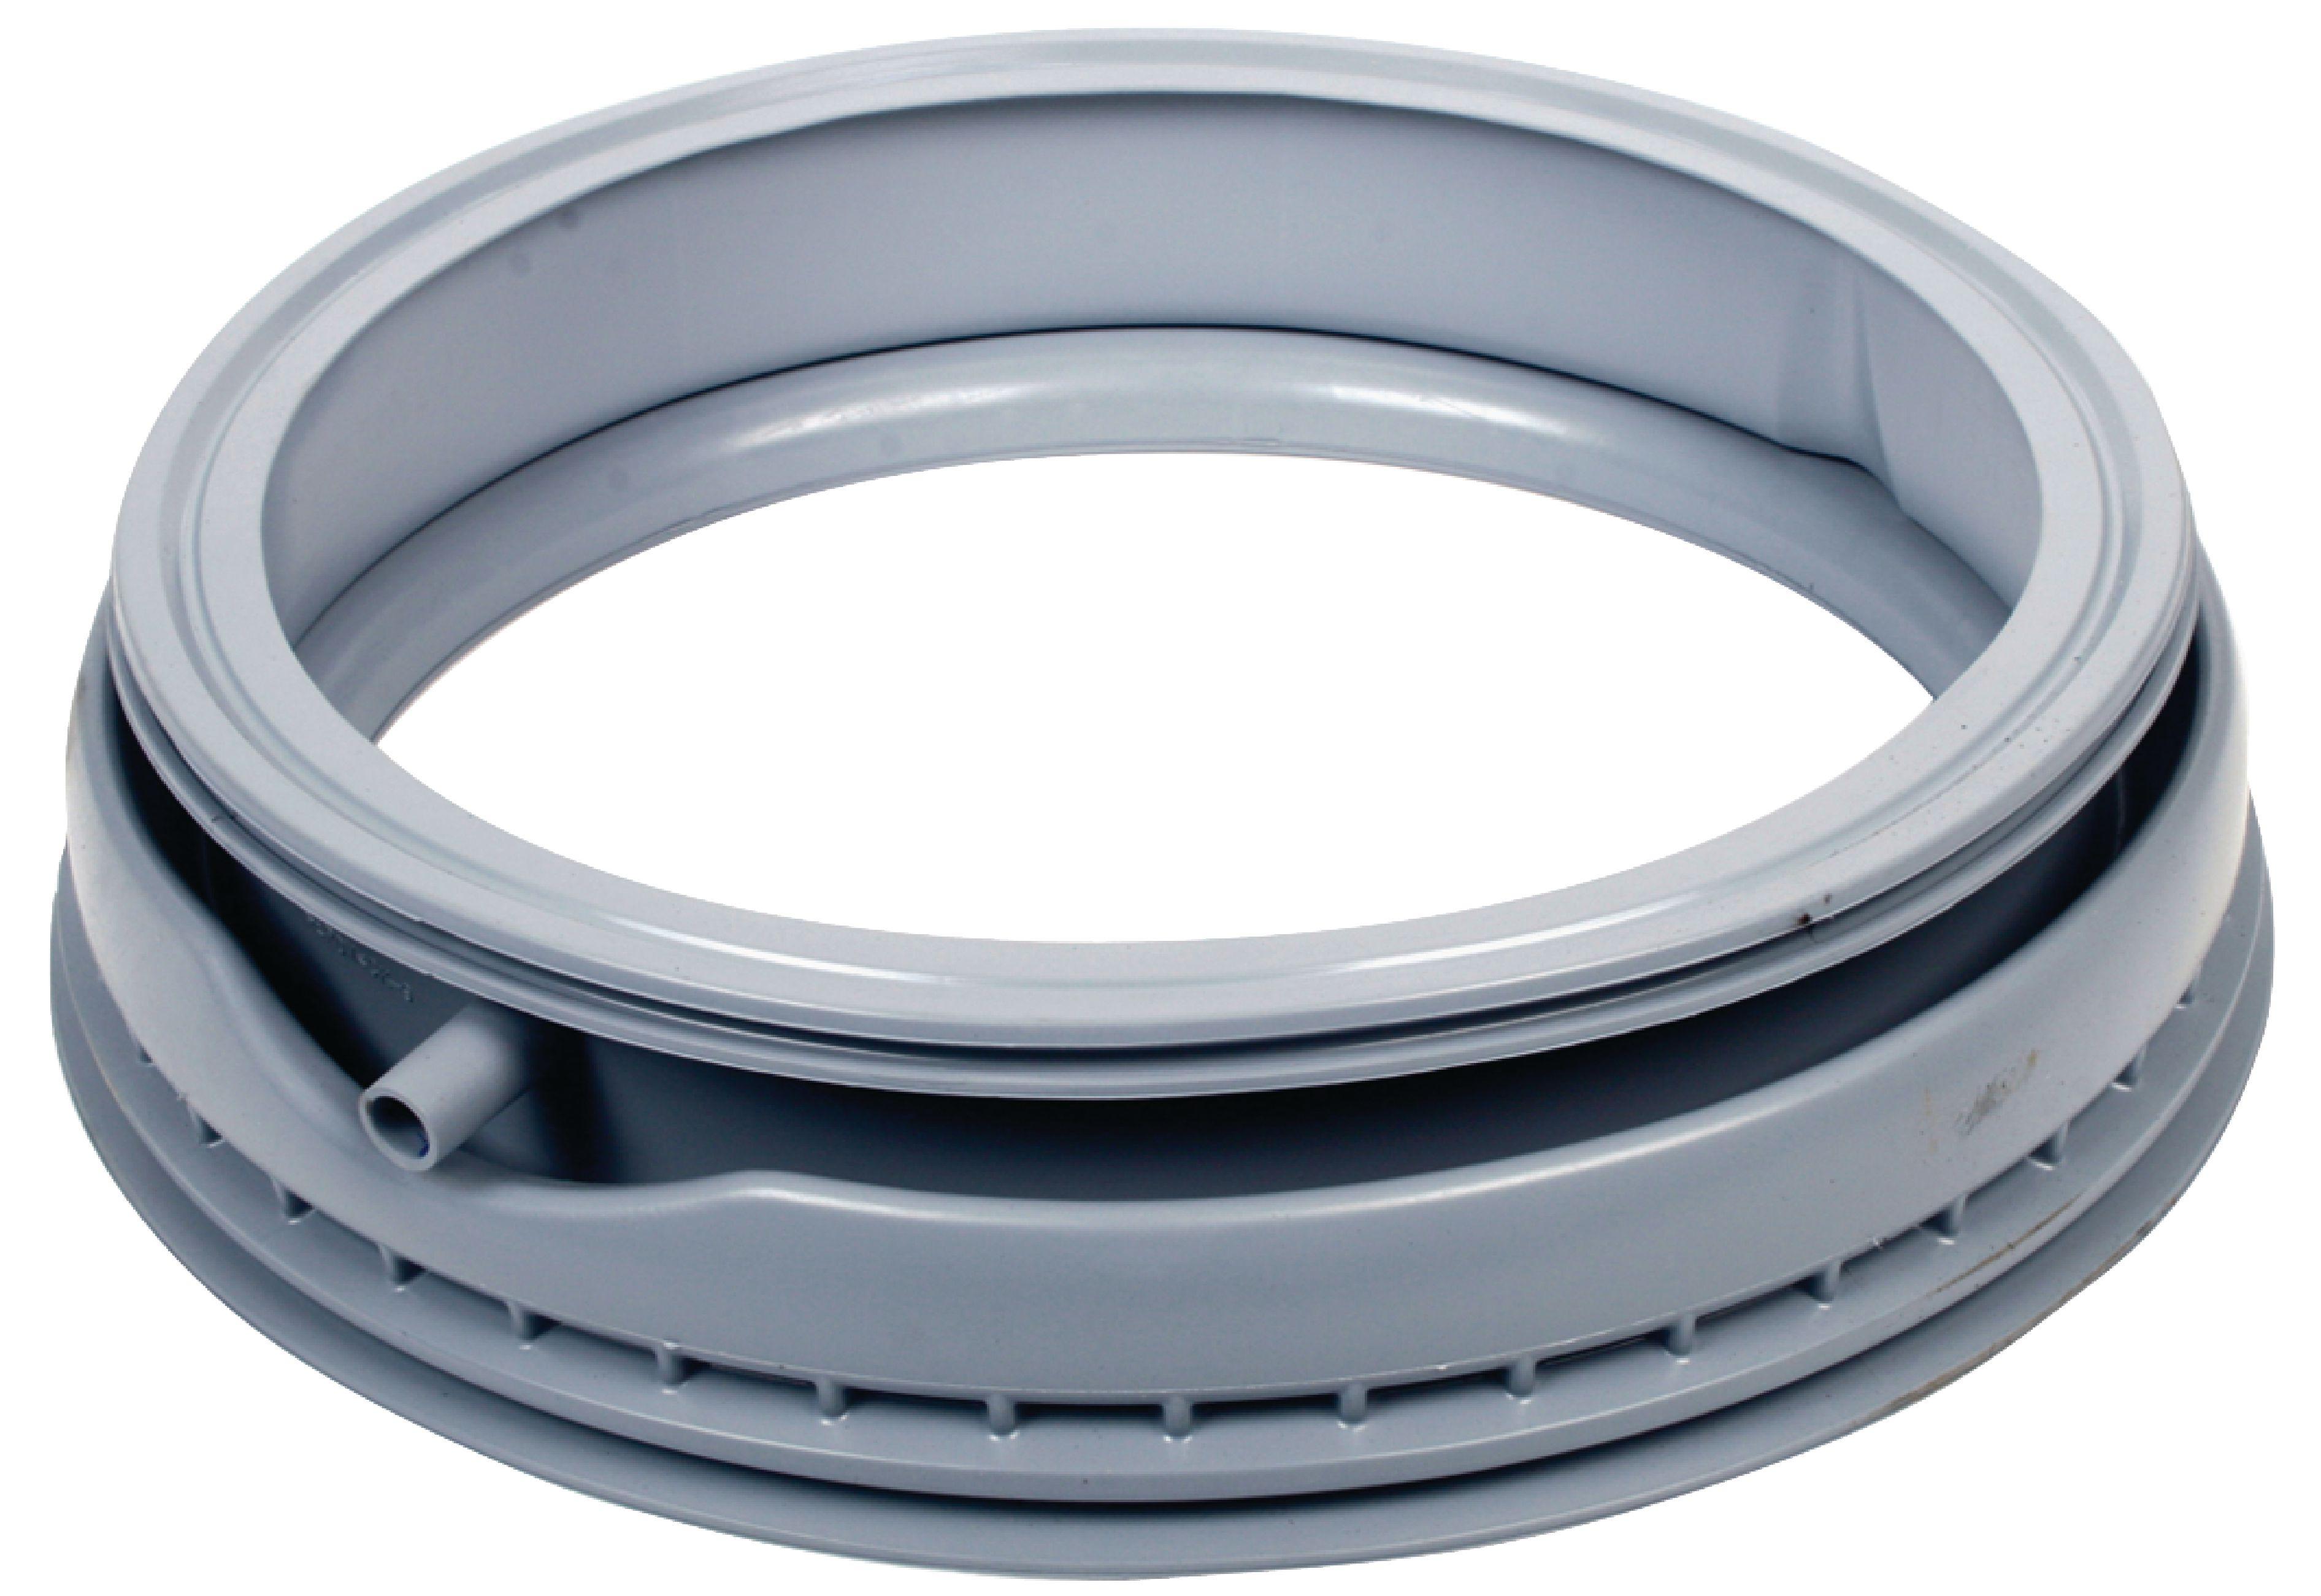 Dveřní manžeta do pračky Bosch, Siemens 361127